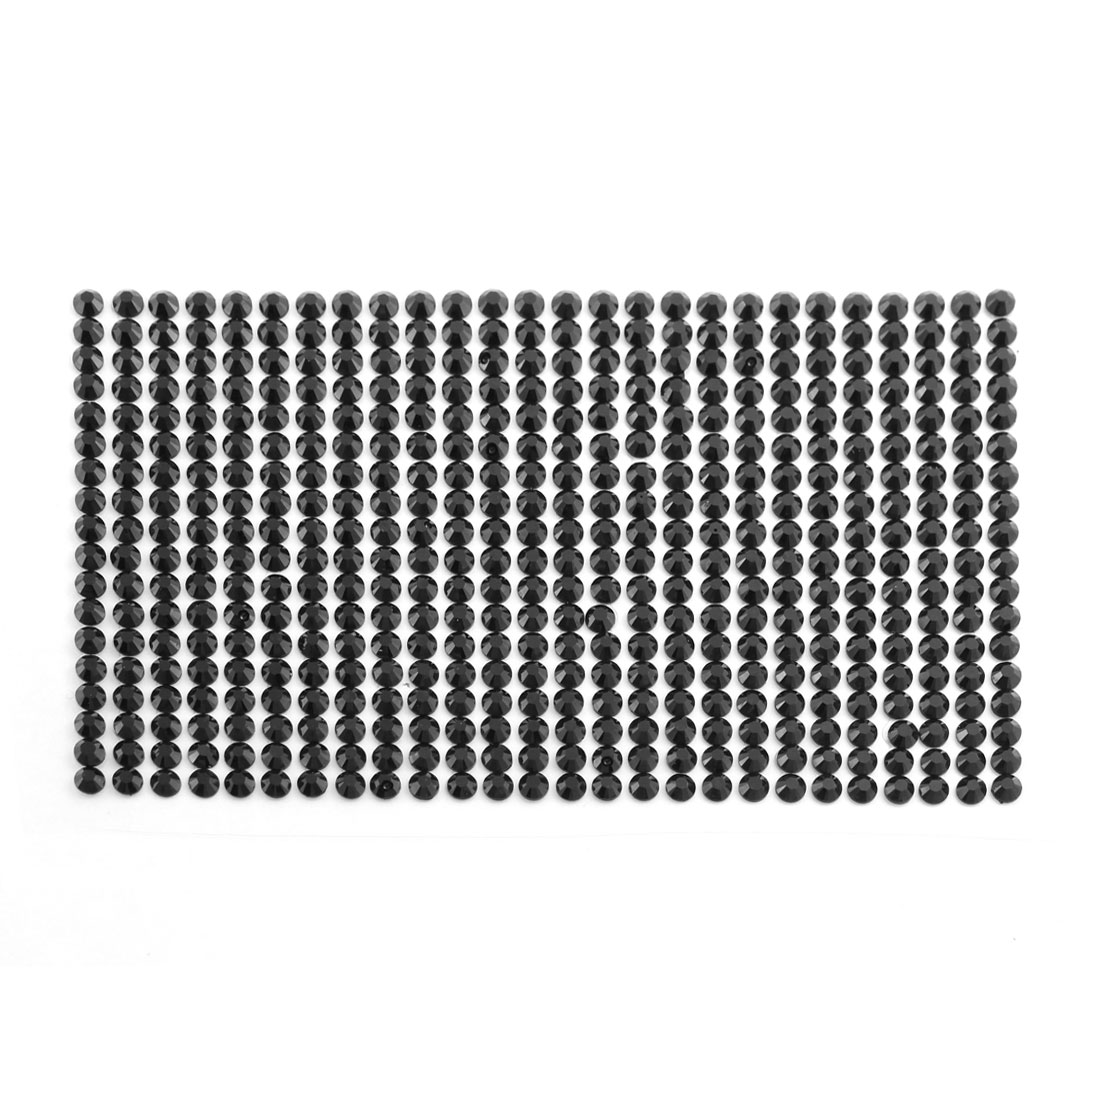 Black 5mm Round Self Adhesive Bling Crystal Rhinestone Decorating DIY Stickers